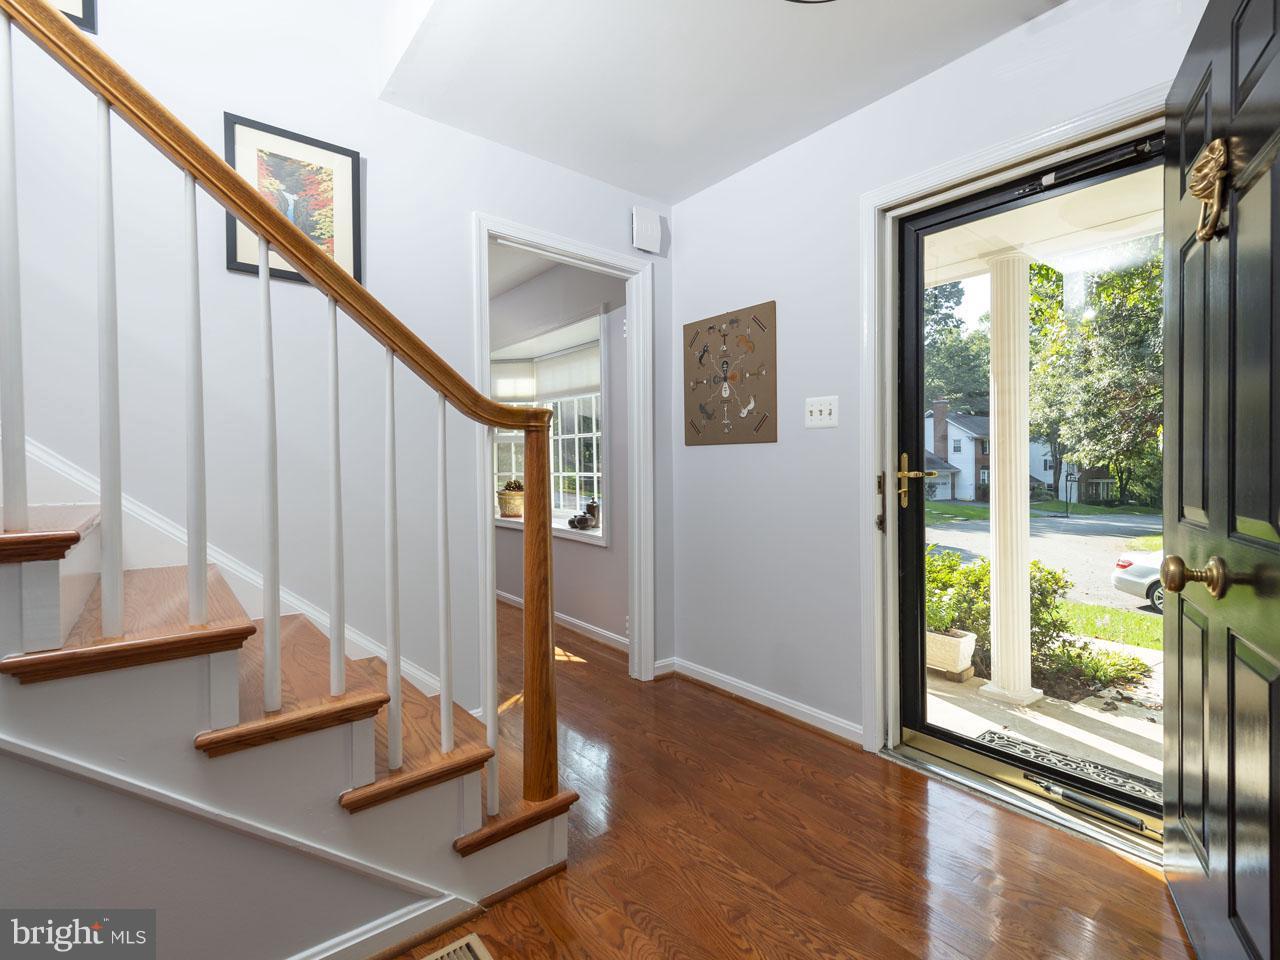 1006211278-300688039710-2021-07-22-07-39-40        Burke Delaware Real Estate For Sale   MLS# 1006211278  - Best of Northern Virginia